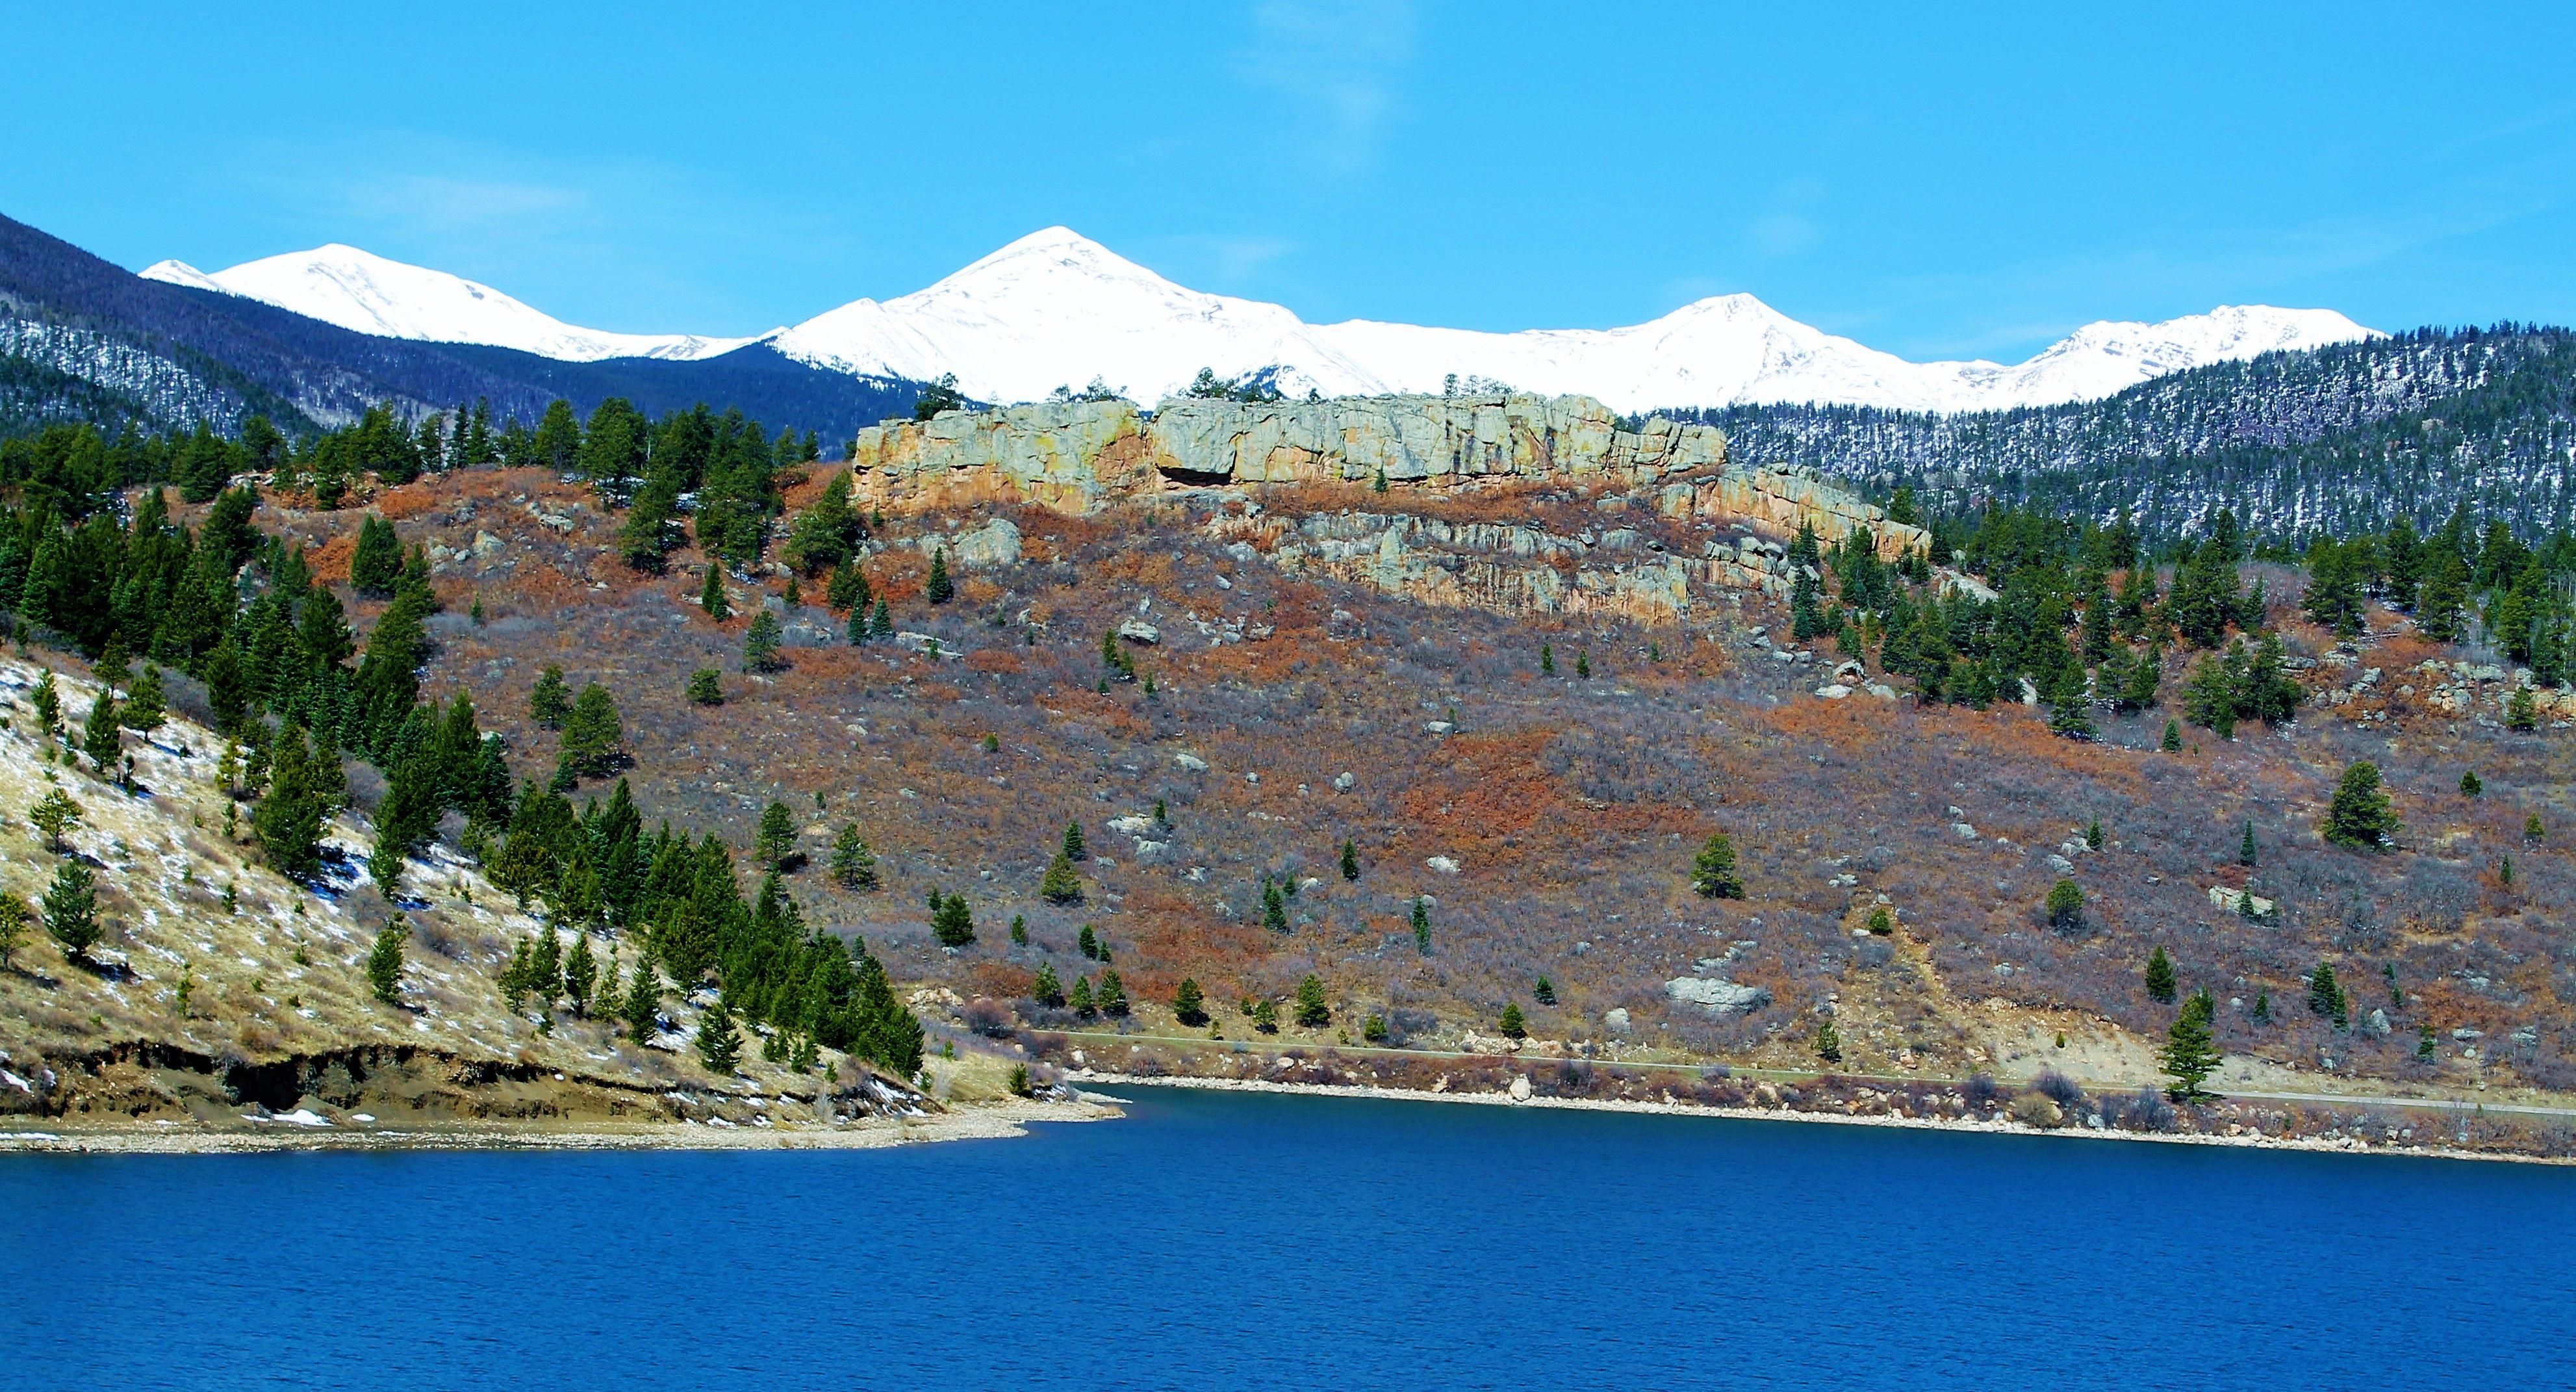 Lake trinidad near the spanish peaks colorado must see